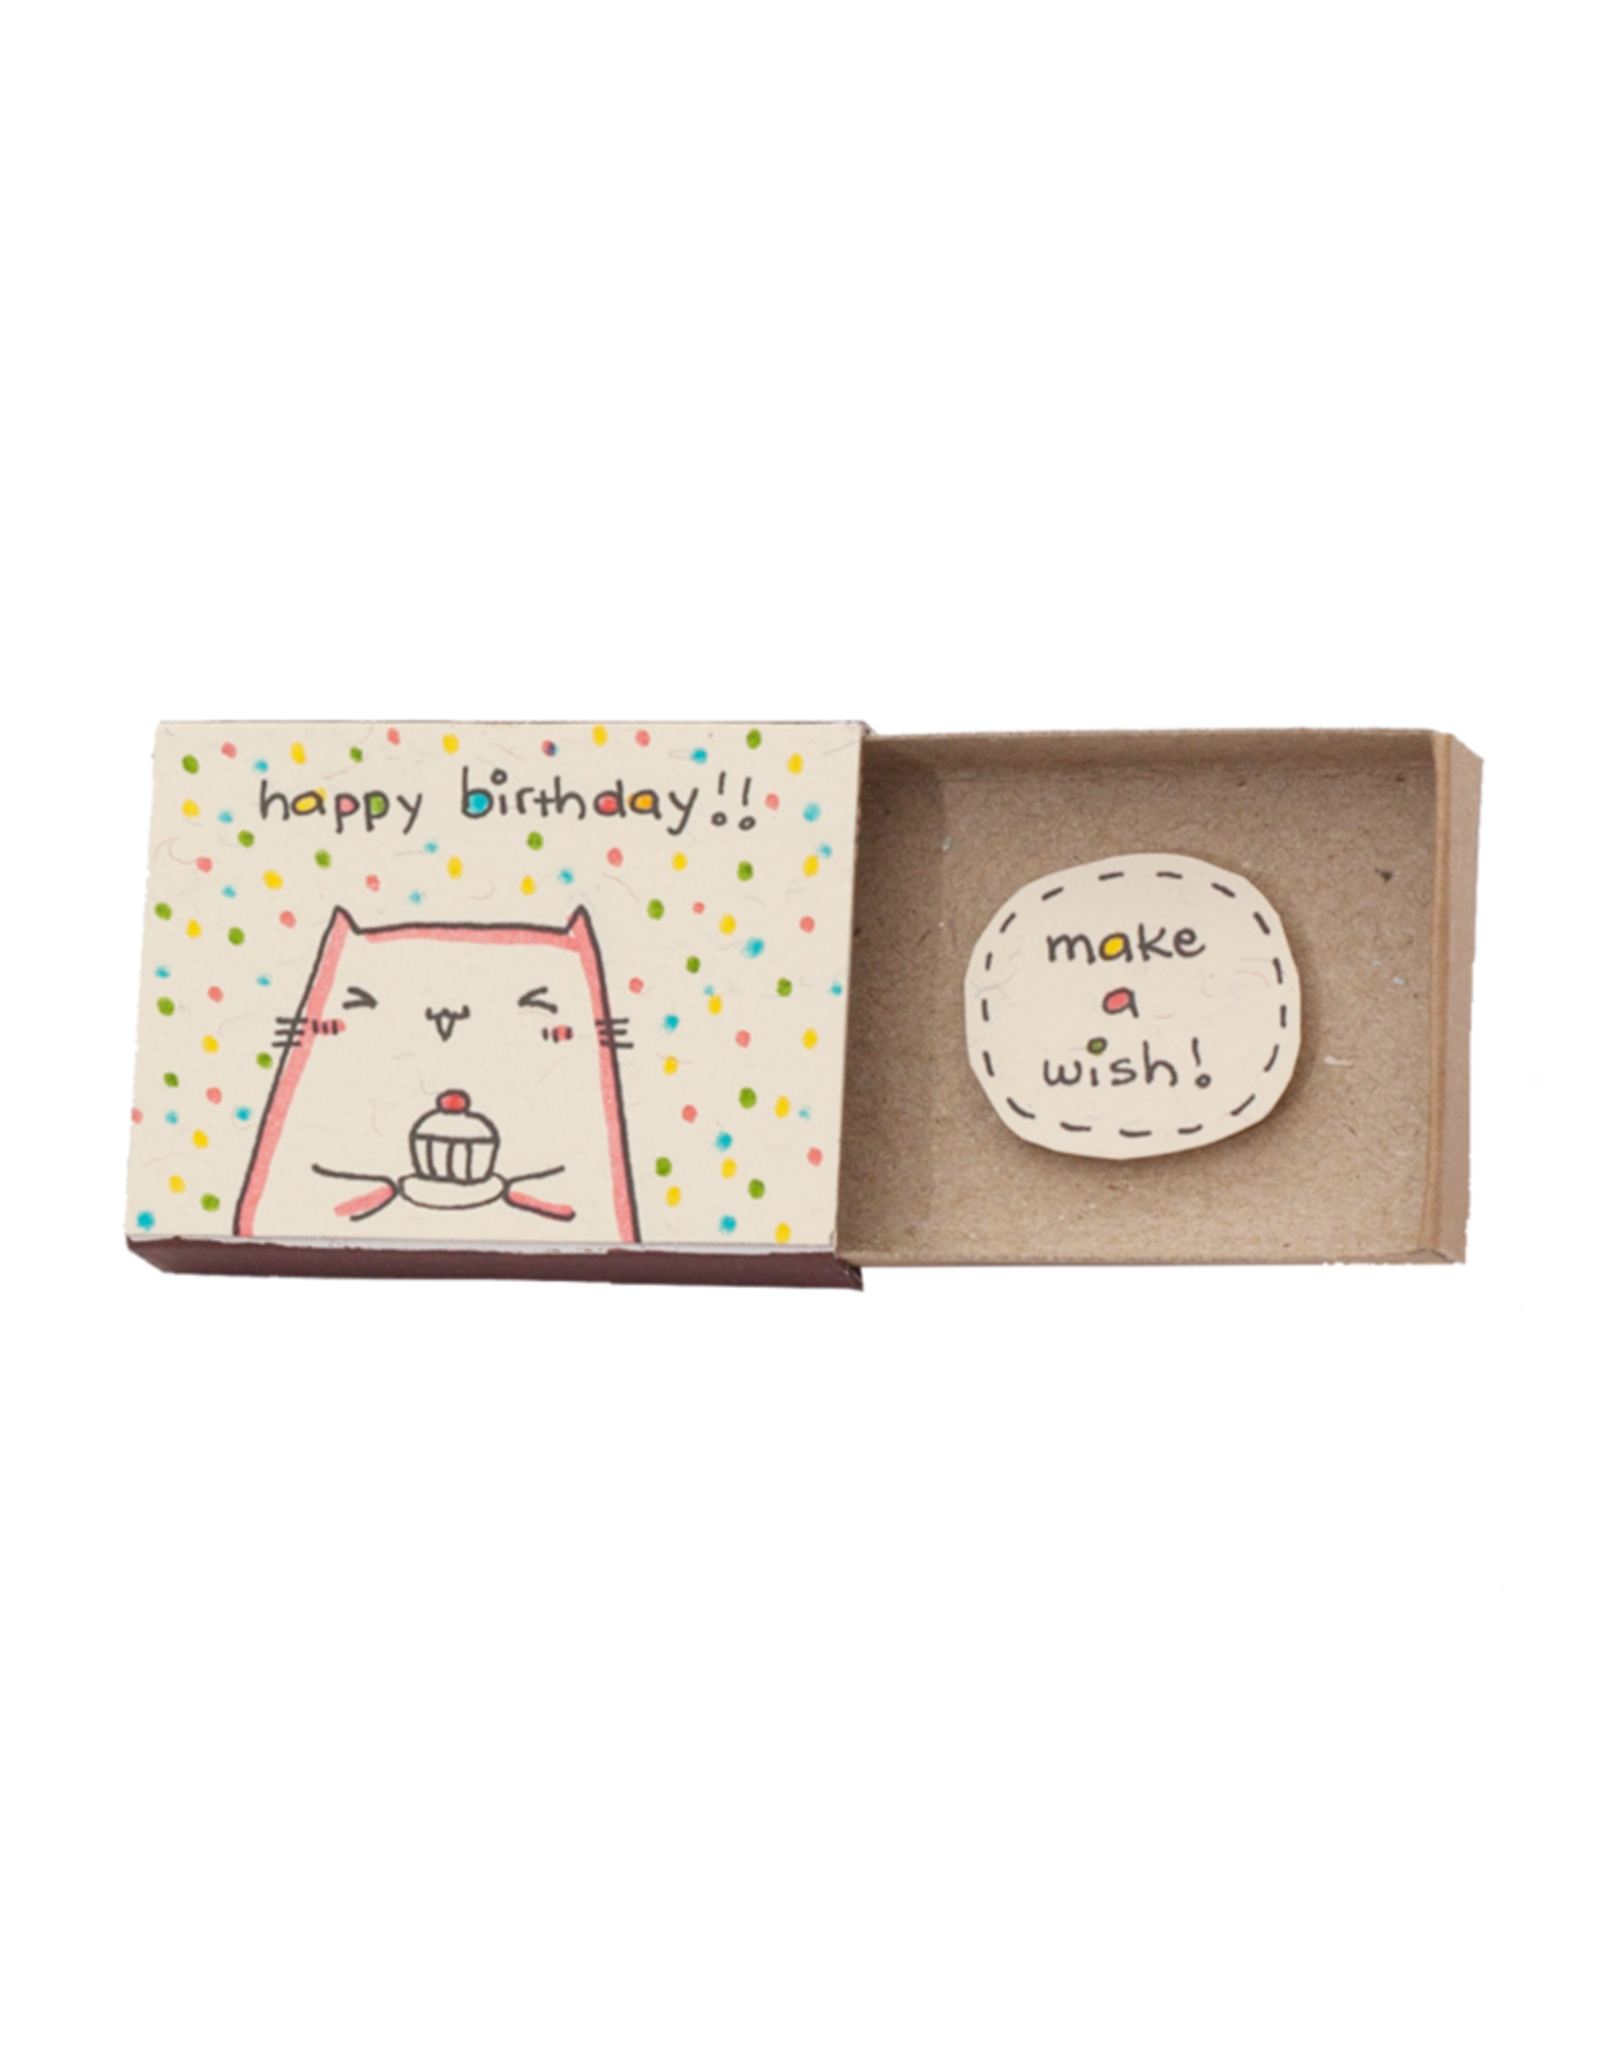 Matchbox Card Birthday Make a Wish Cupcake Cat